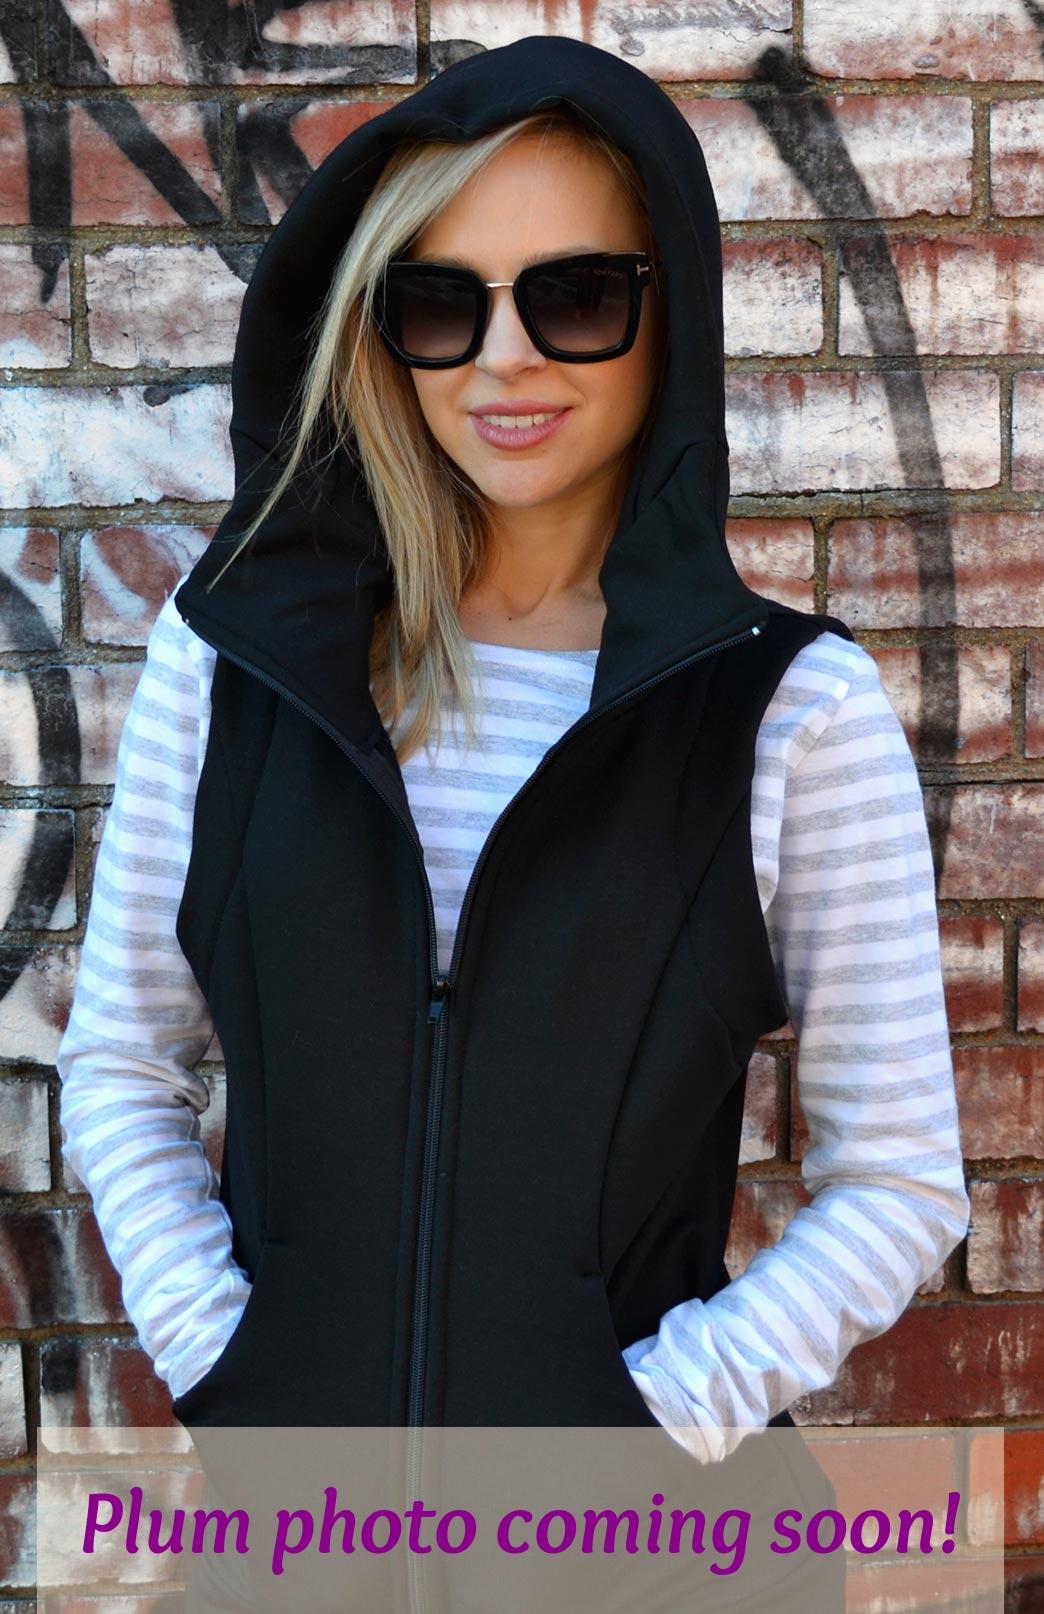 Fitted Fleece Vest with Hood - Women's Fitted Merino Wool Fleece Vest with Deep Pockets and Double Layer Hood - Smitten Merino Tasmania Australia